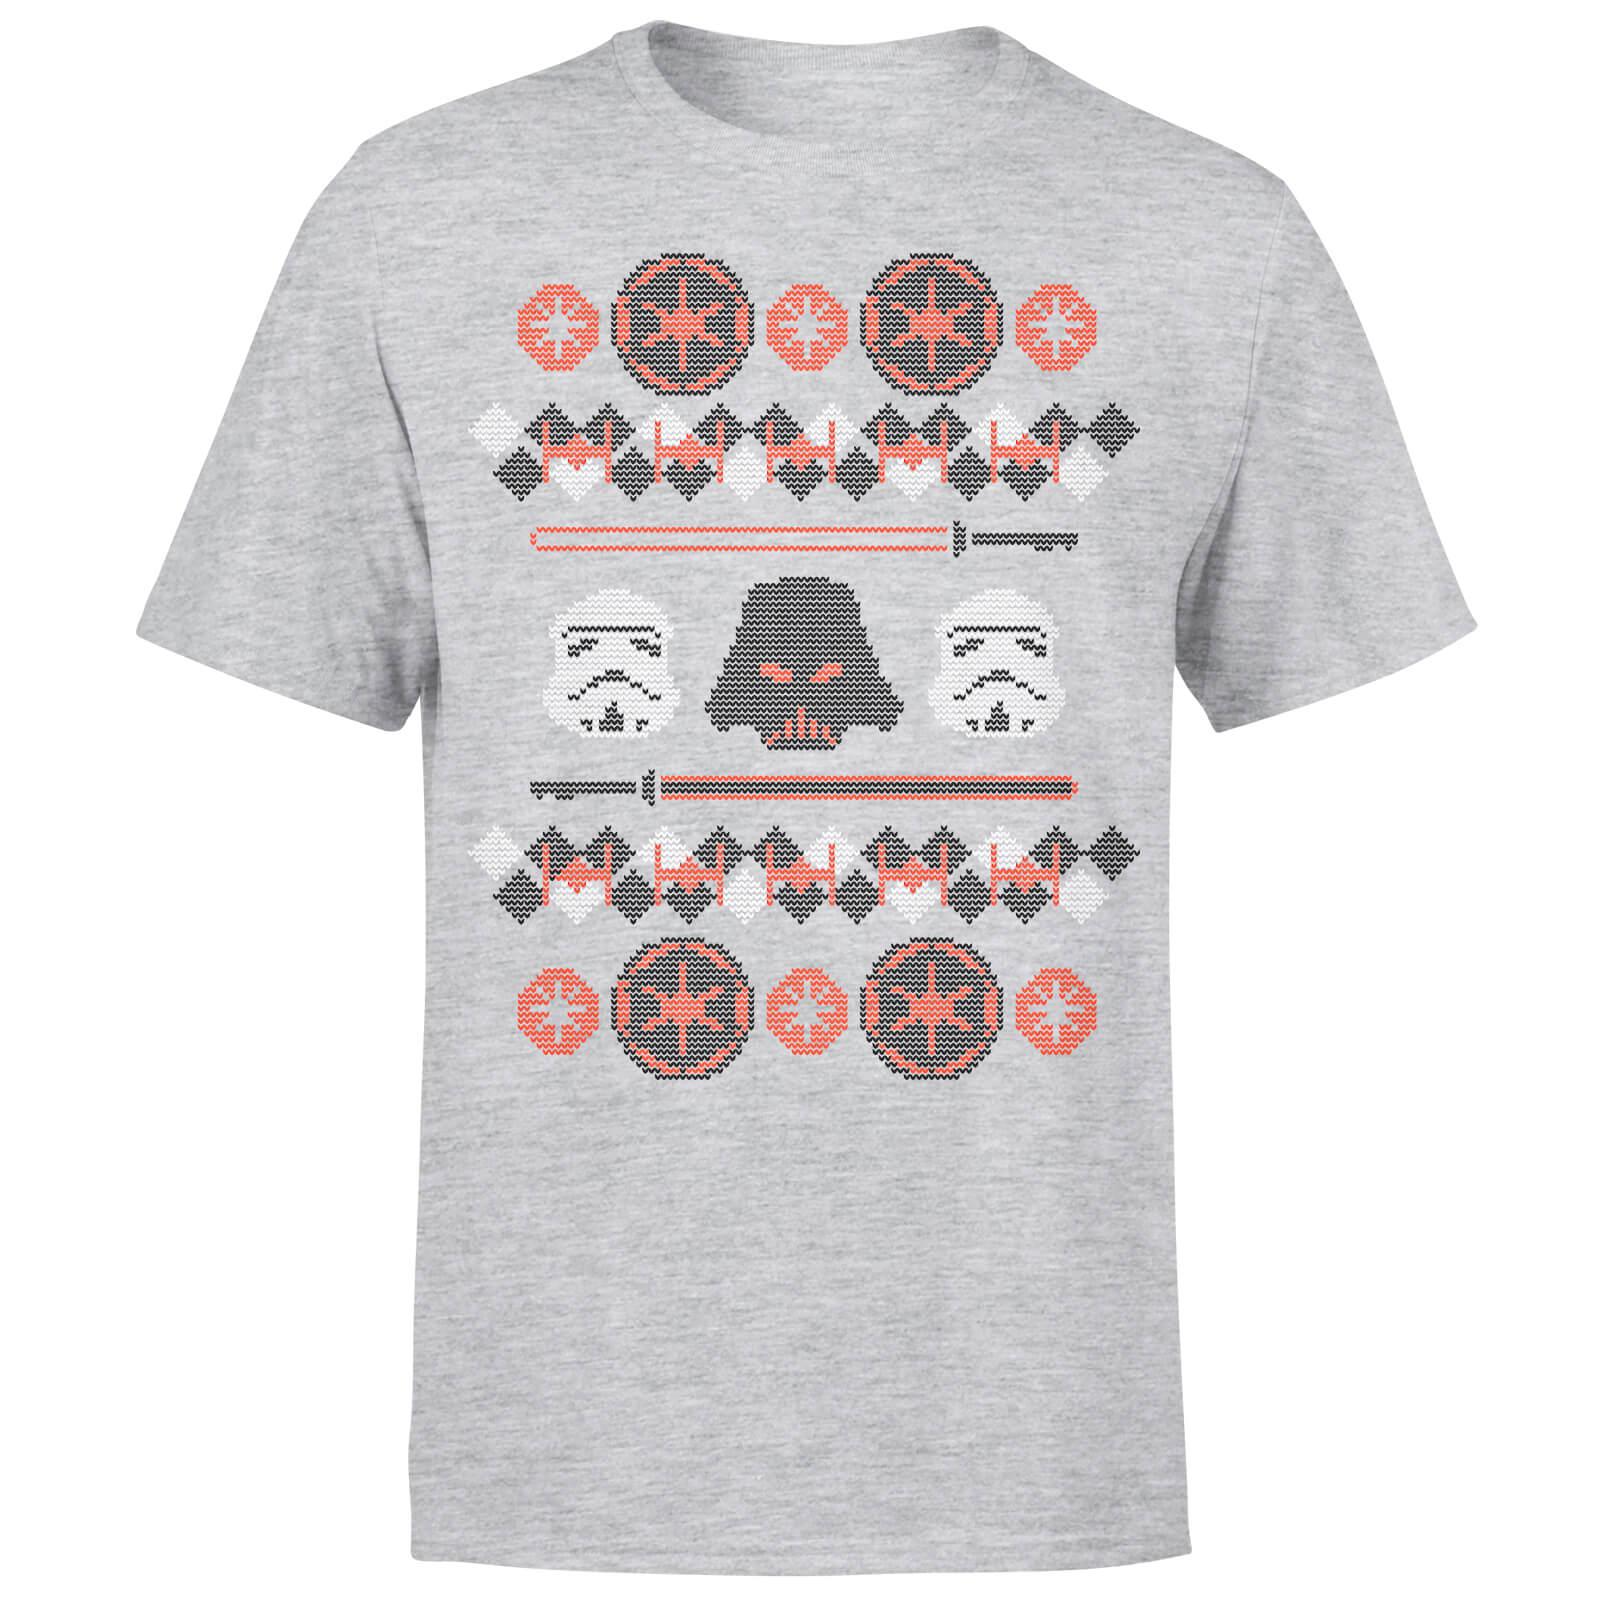 Star Wars T-Shirt Homme Sucre d'Orge Yoda Star Wars - Noir - XXL - Gris